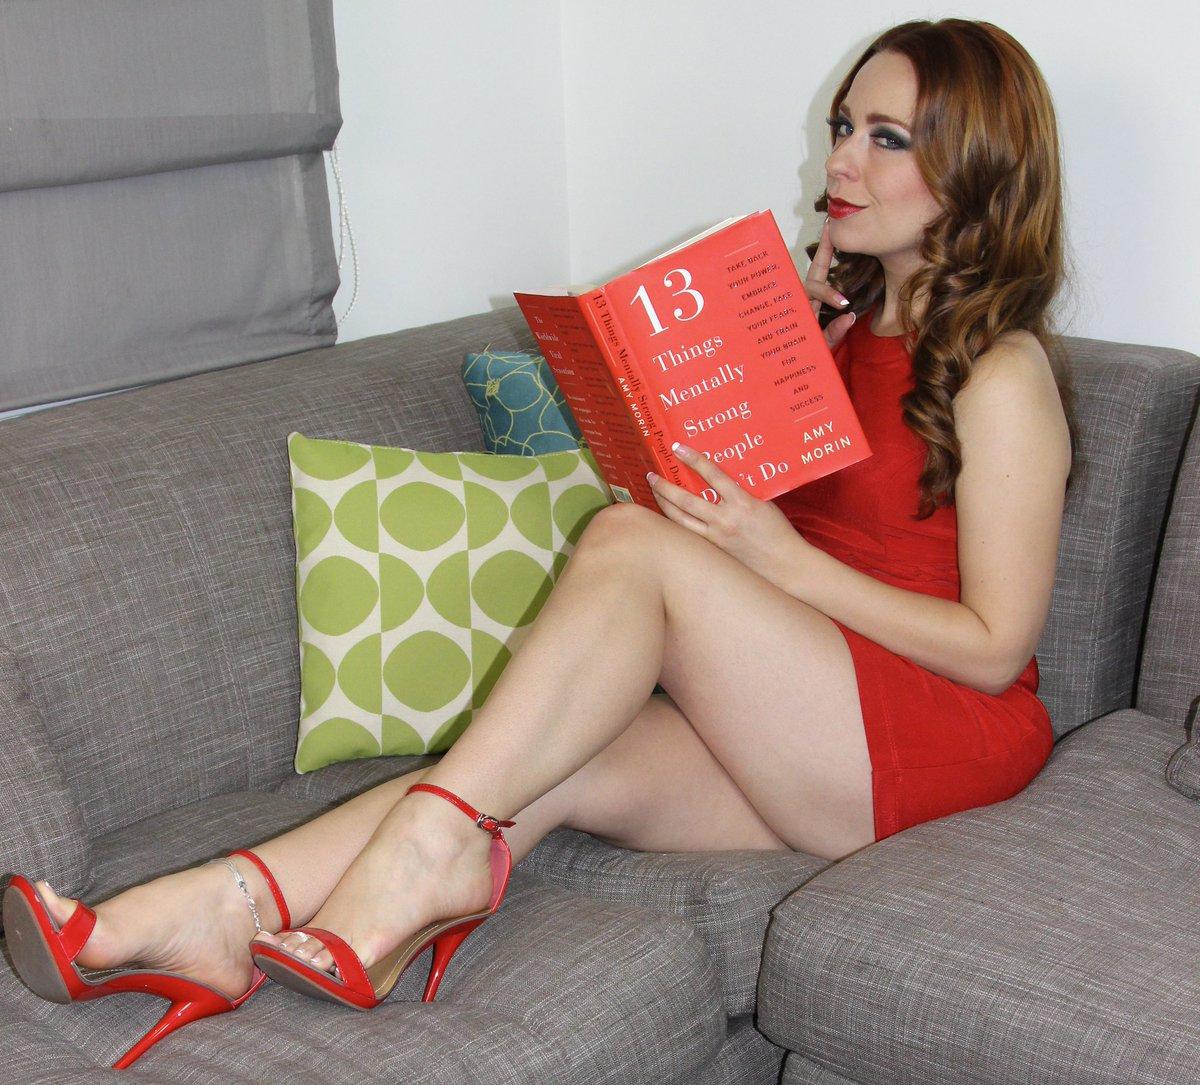 Sexy pale redhead feet